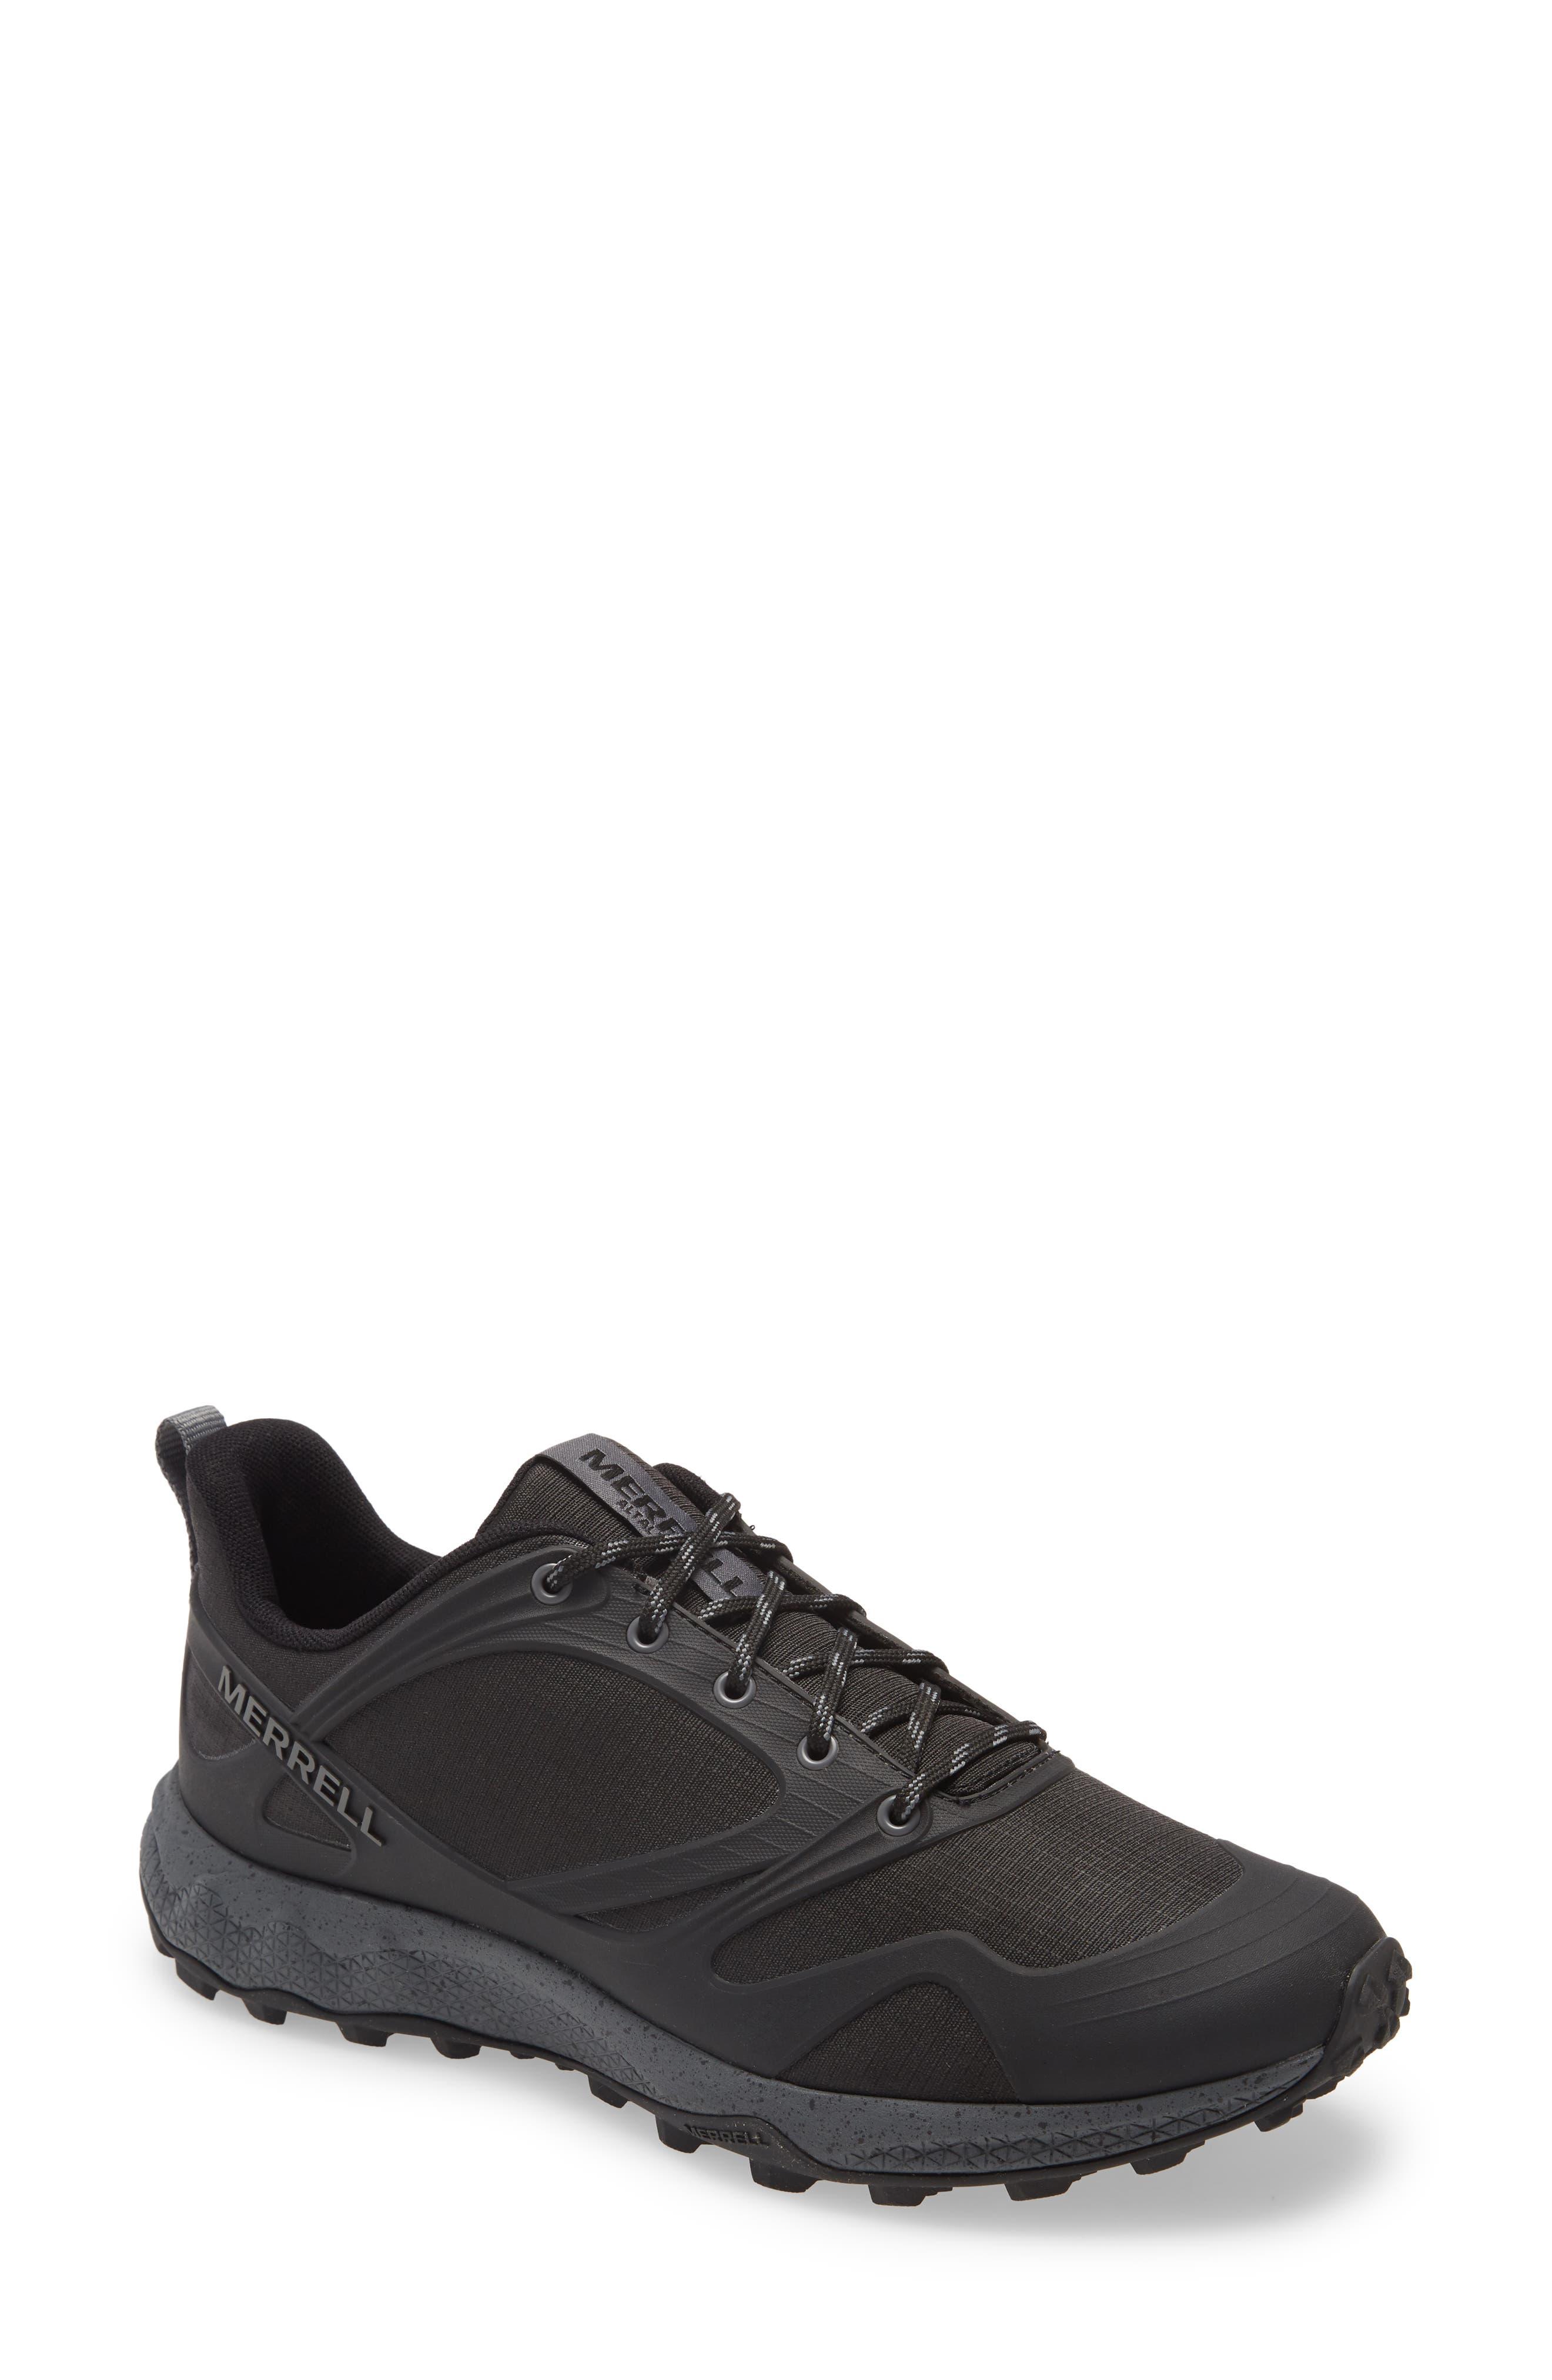 Altalight Hiking Shoe